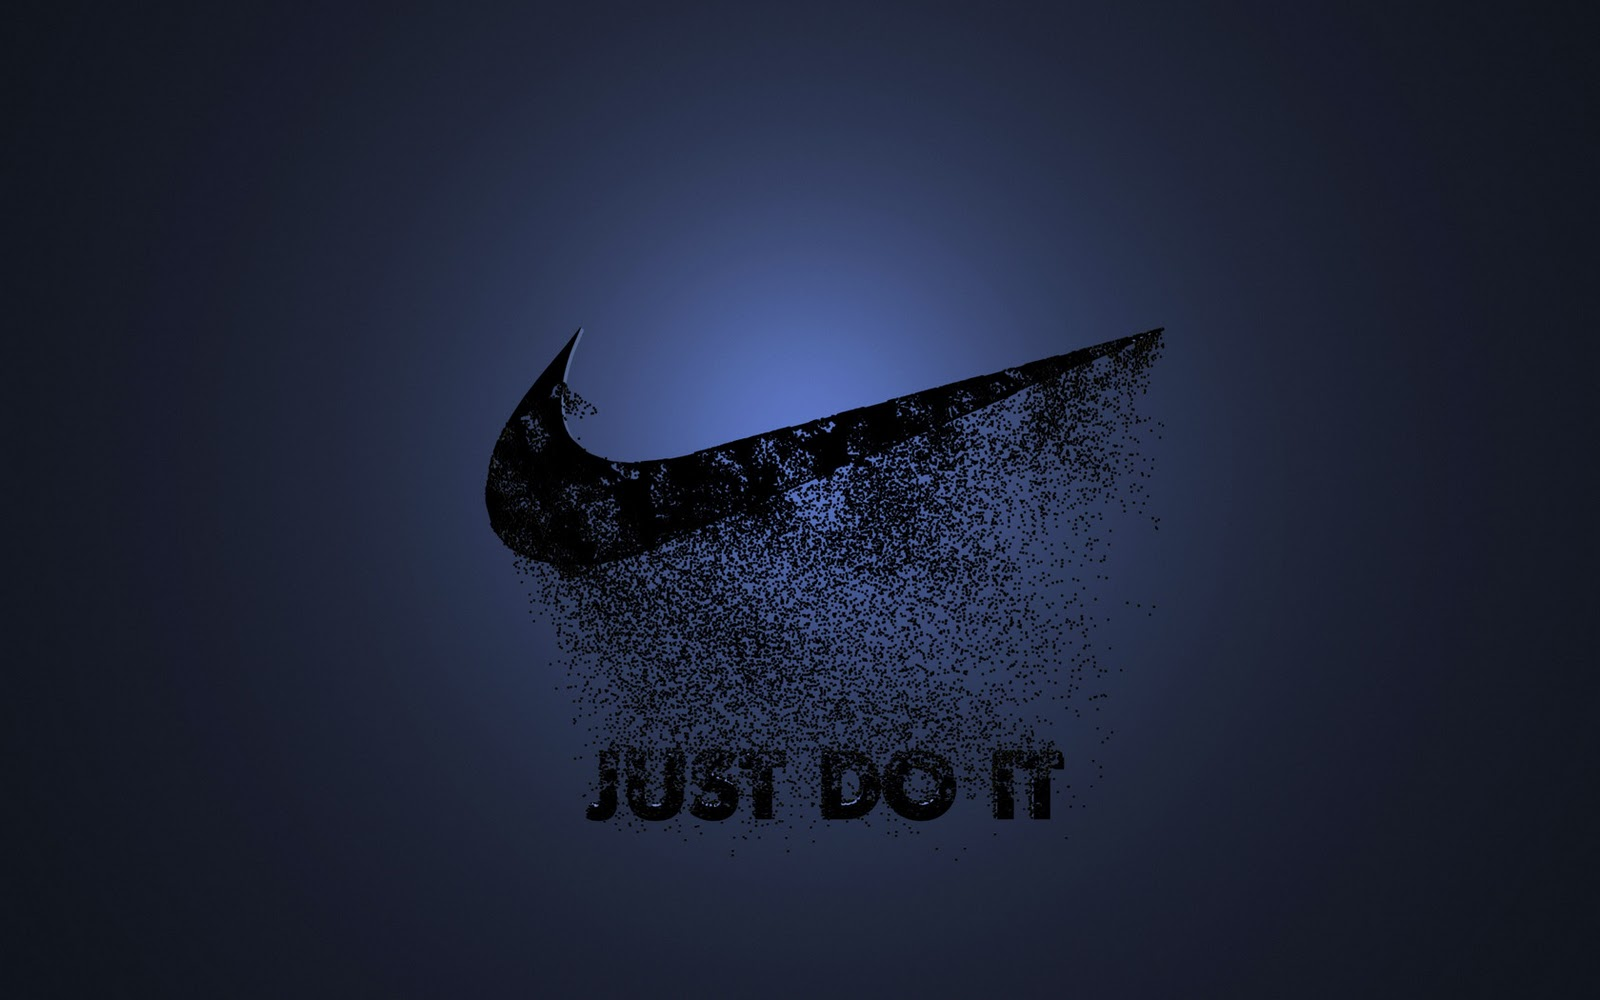 Logo nike wallpaper wallpapersafari - Nike Wallpaper Just Do It Hd Wallpaper Background